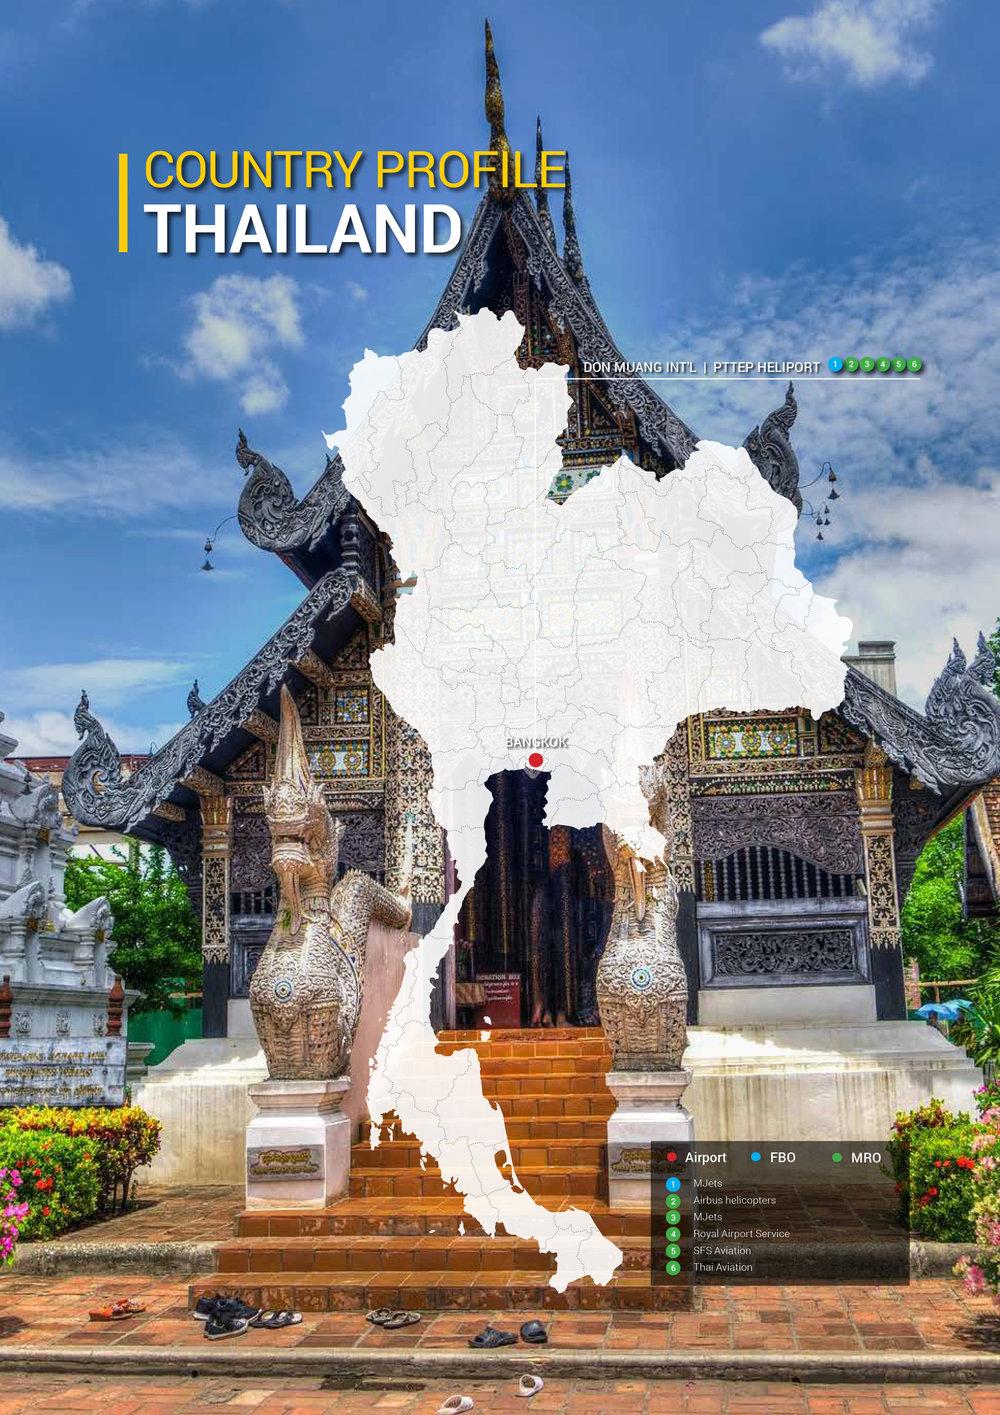 IR-Thailand-1.jpg